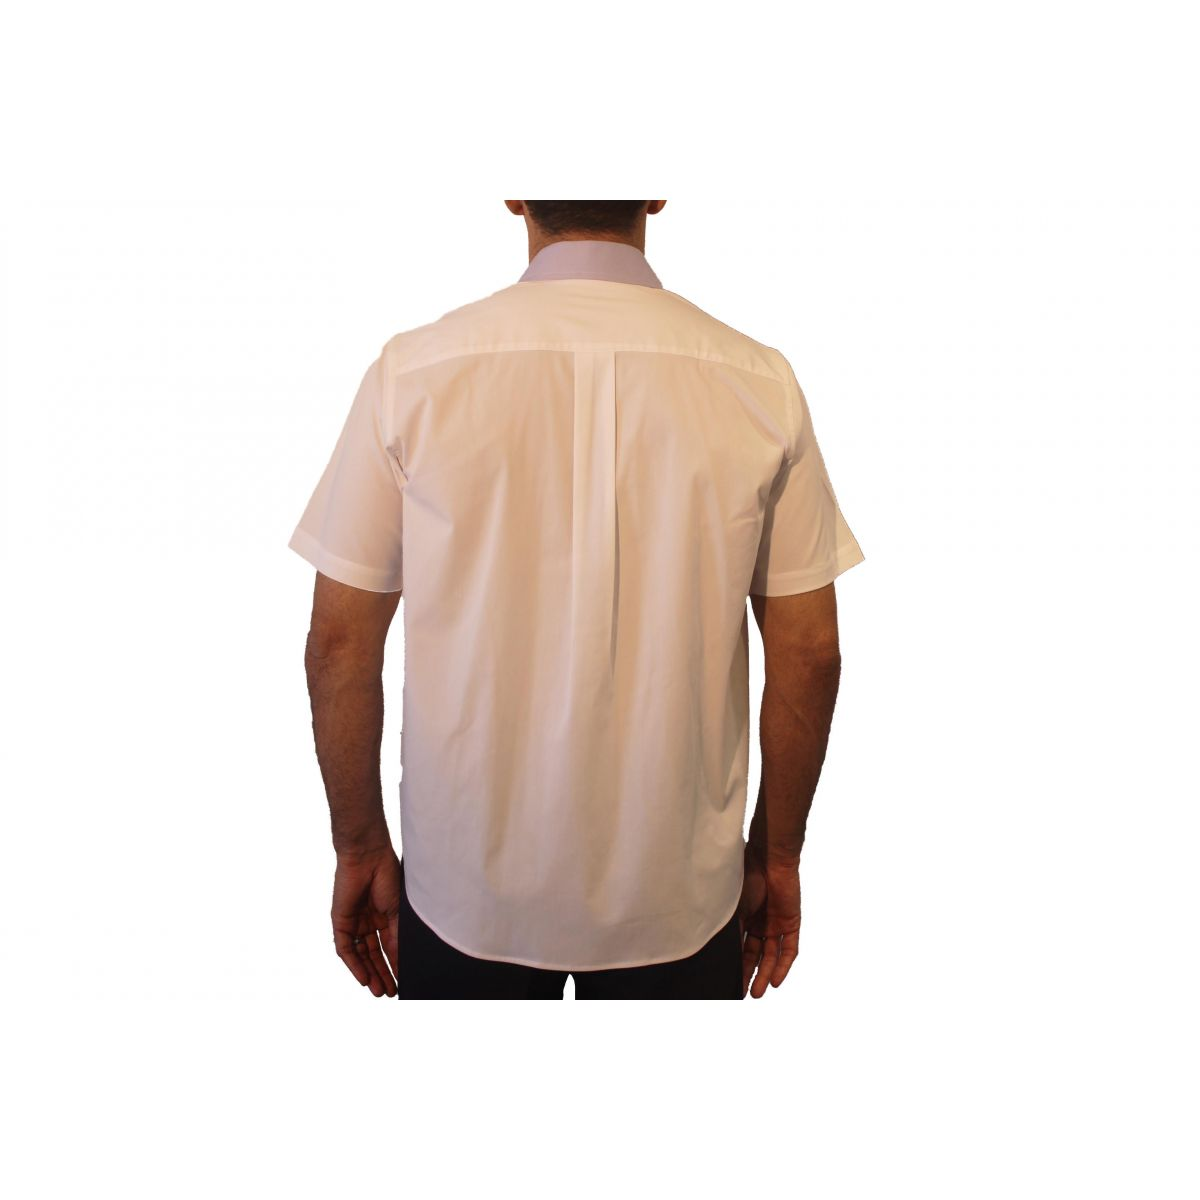 Camisa Social Masculina Manga Curta  - Uniformes Odontoclinic